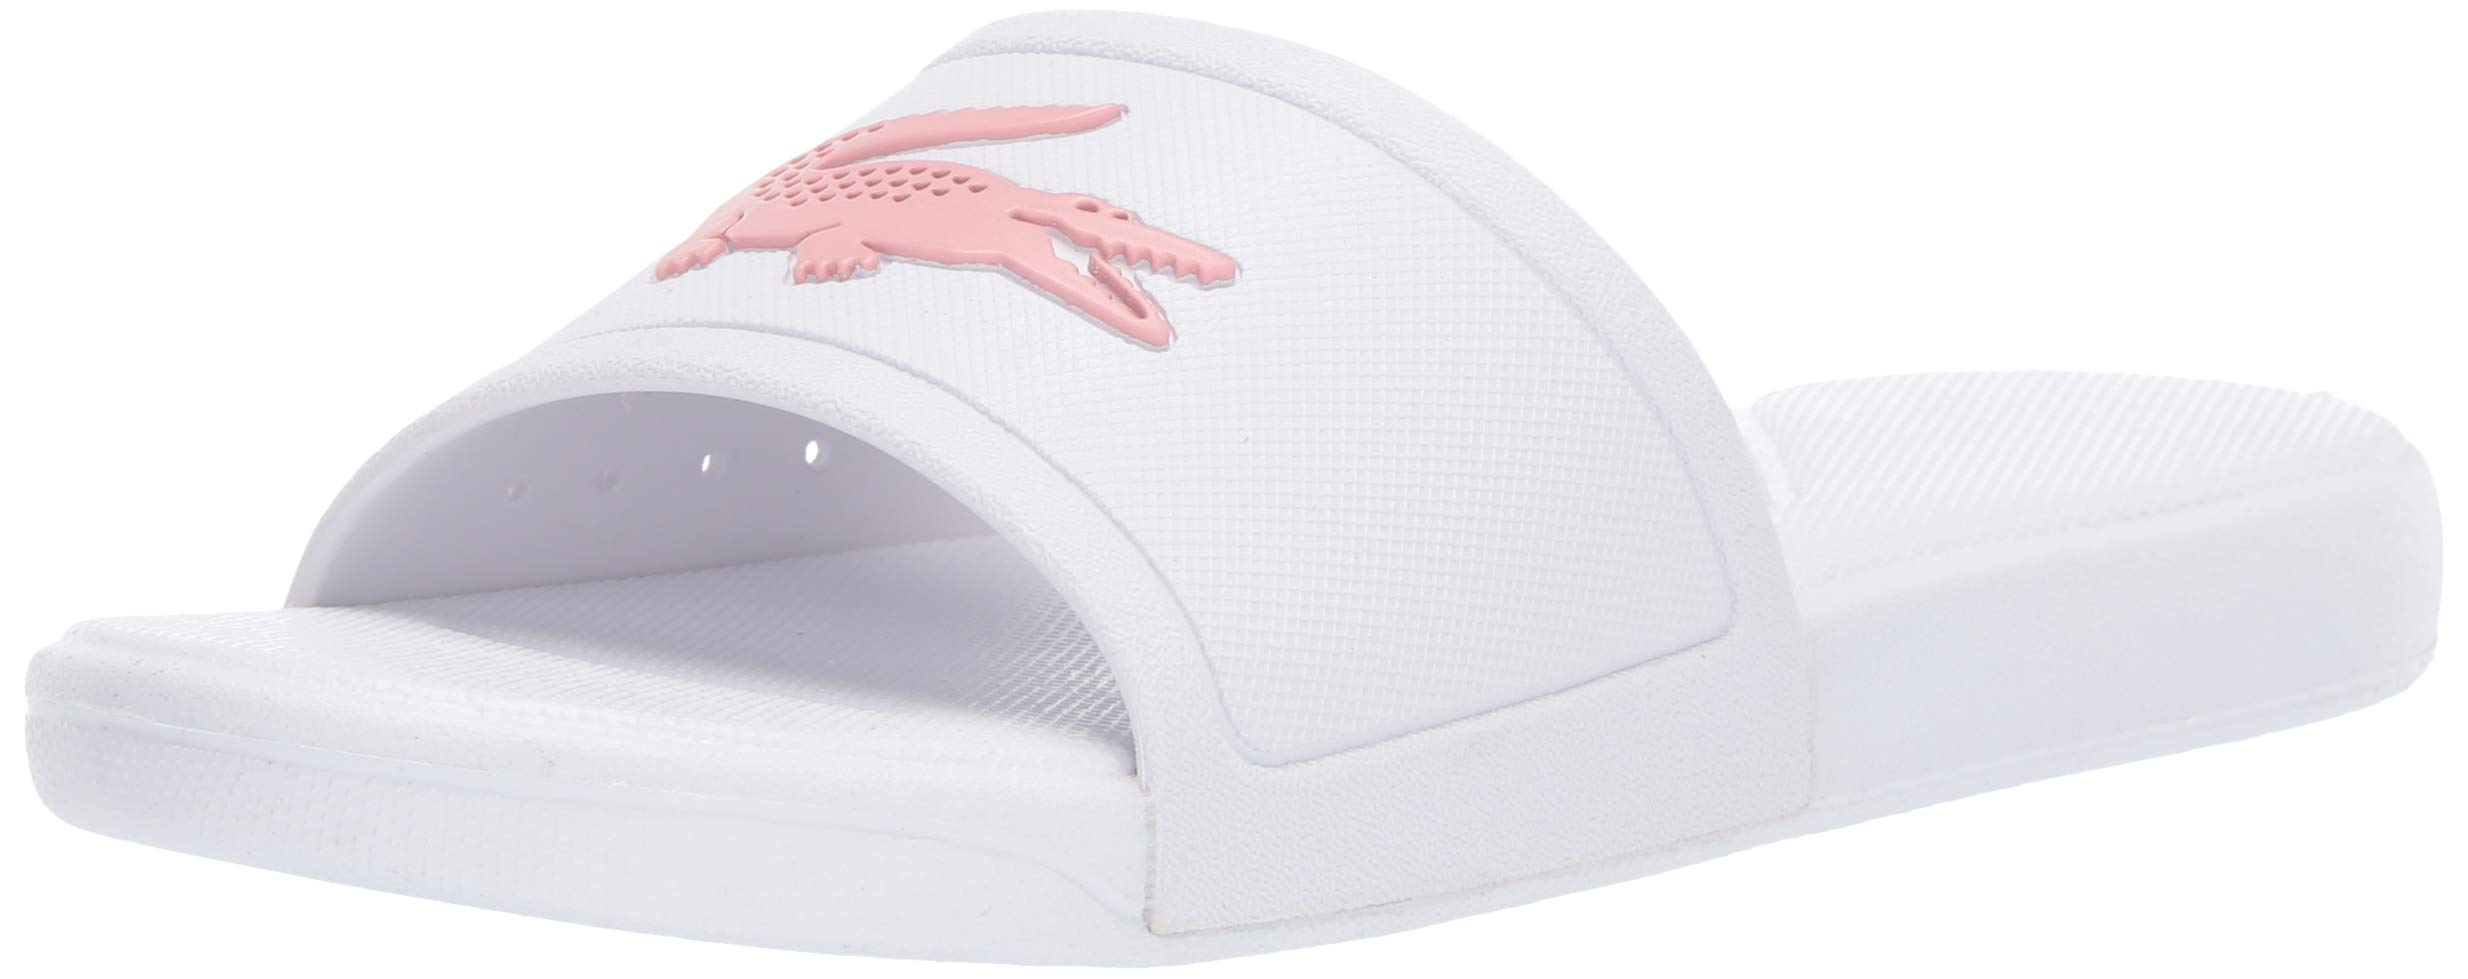 Lacoste Girls' L.30 Slide Sandal white/light pink 3 Medium US Big Kid